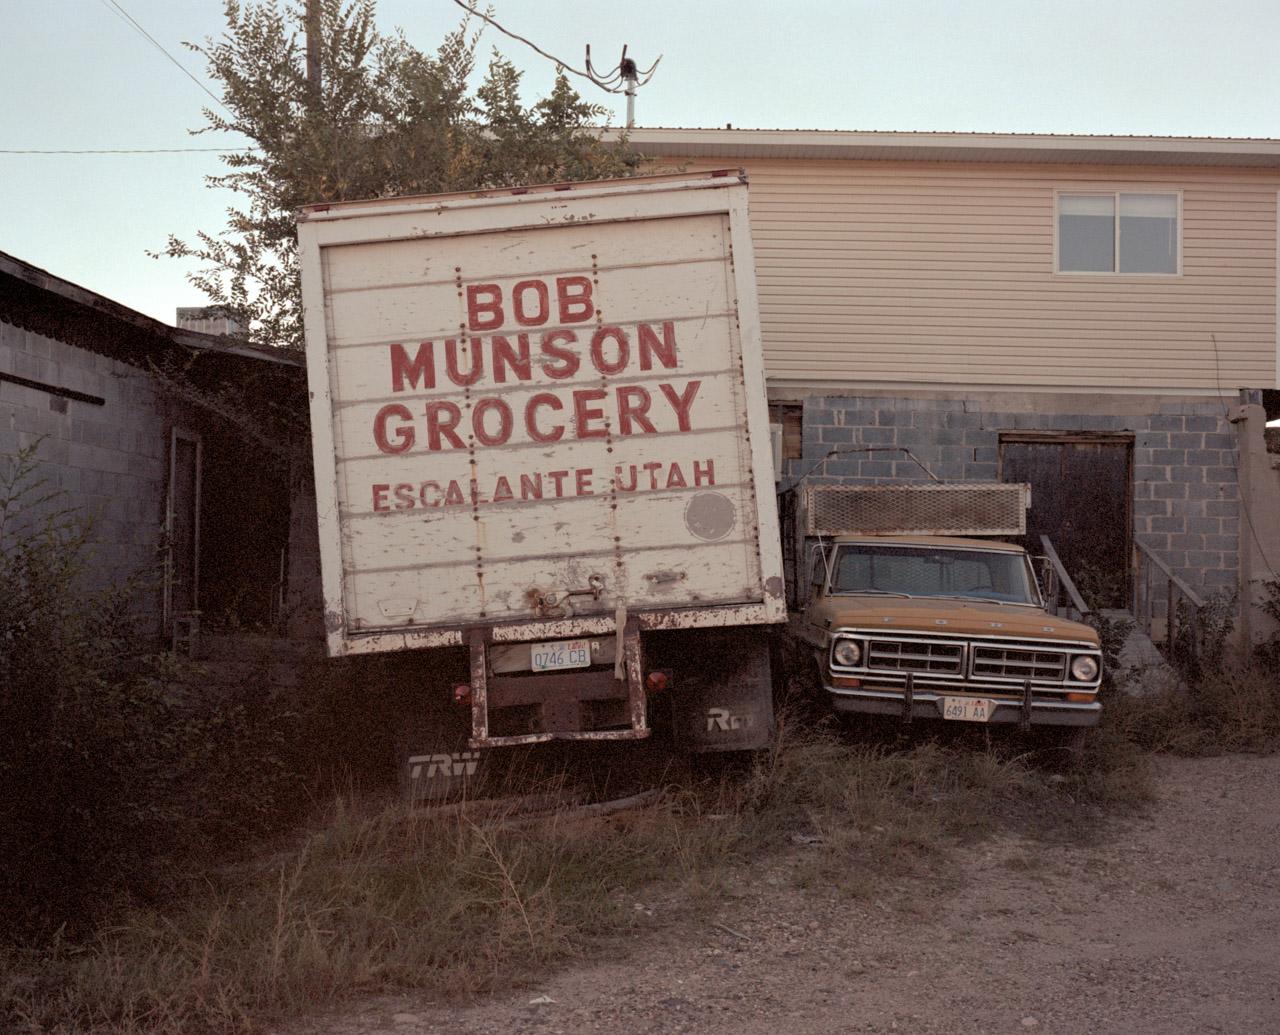 Bob Munson Grocery. Escalante, Utah. October 2013